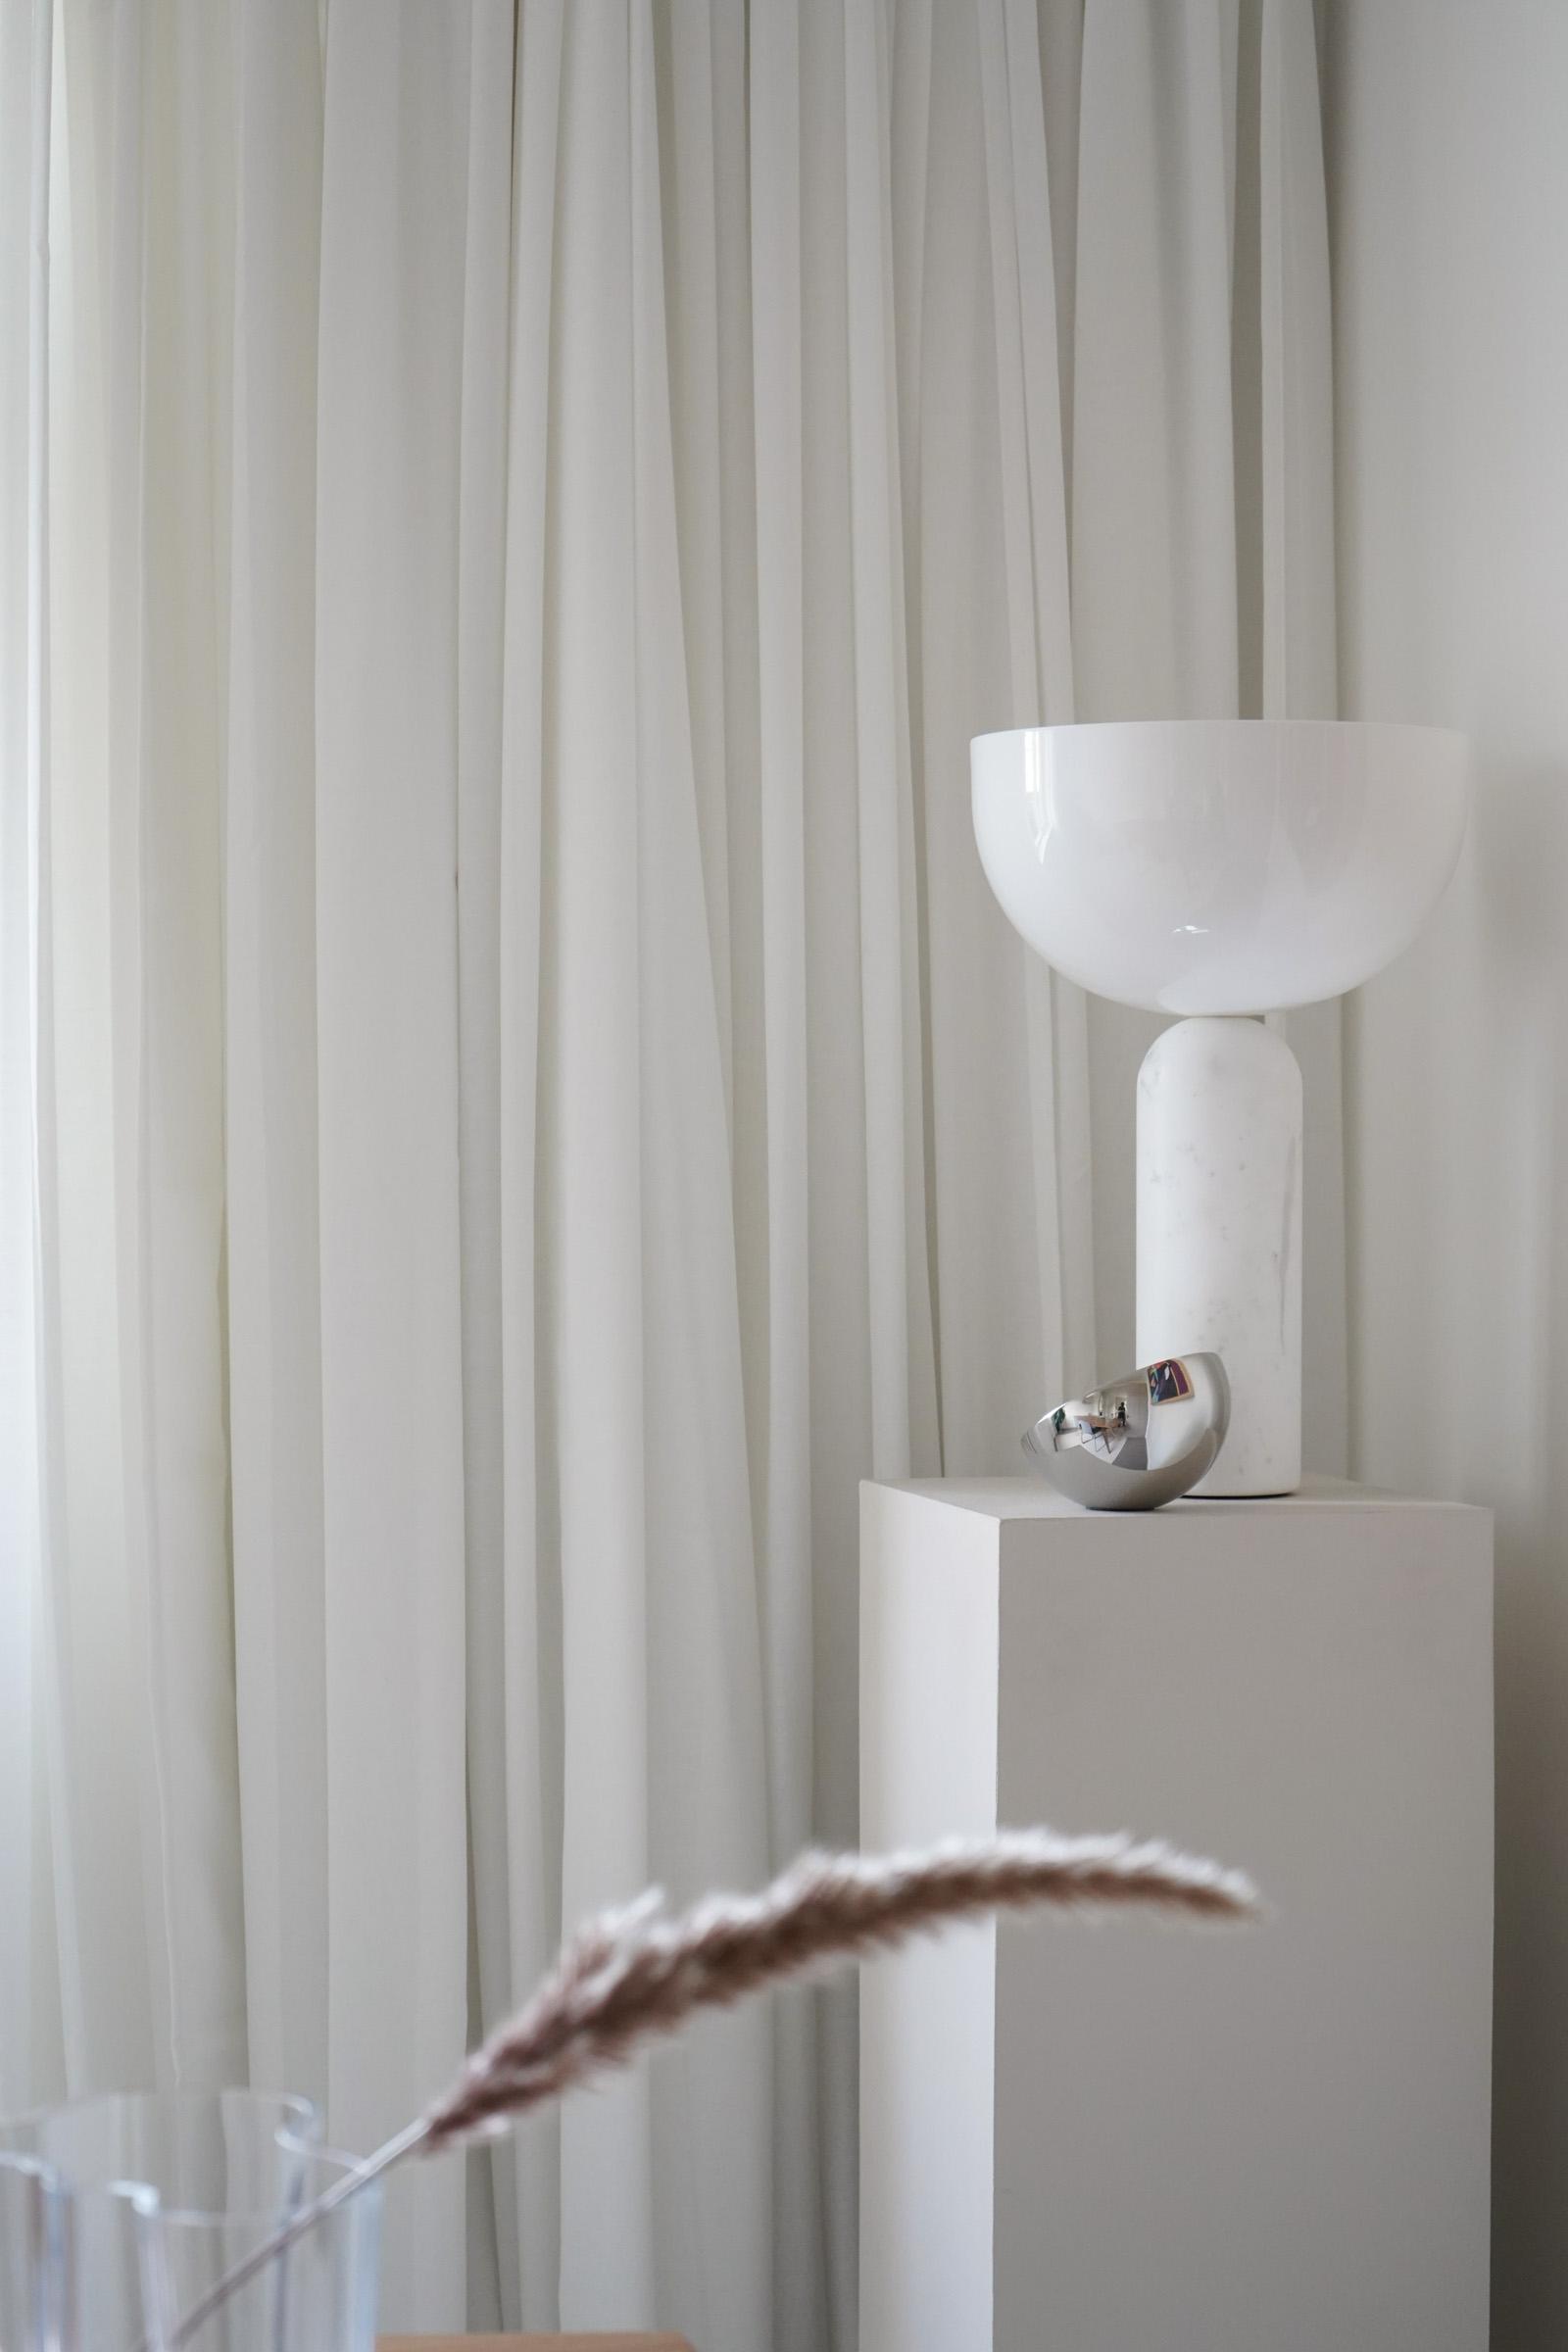 New Works Kizu Lamp